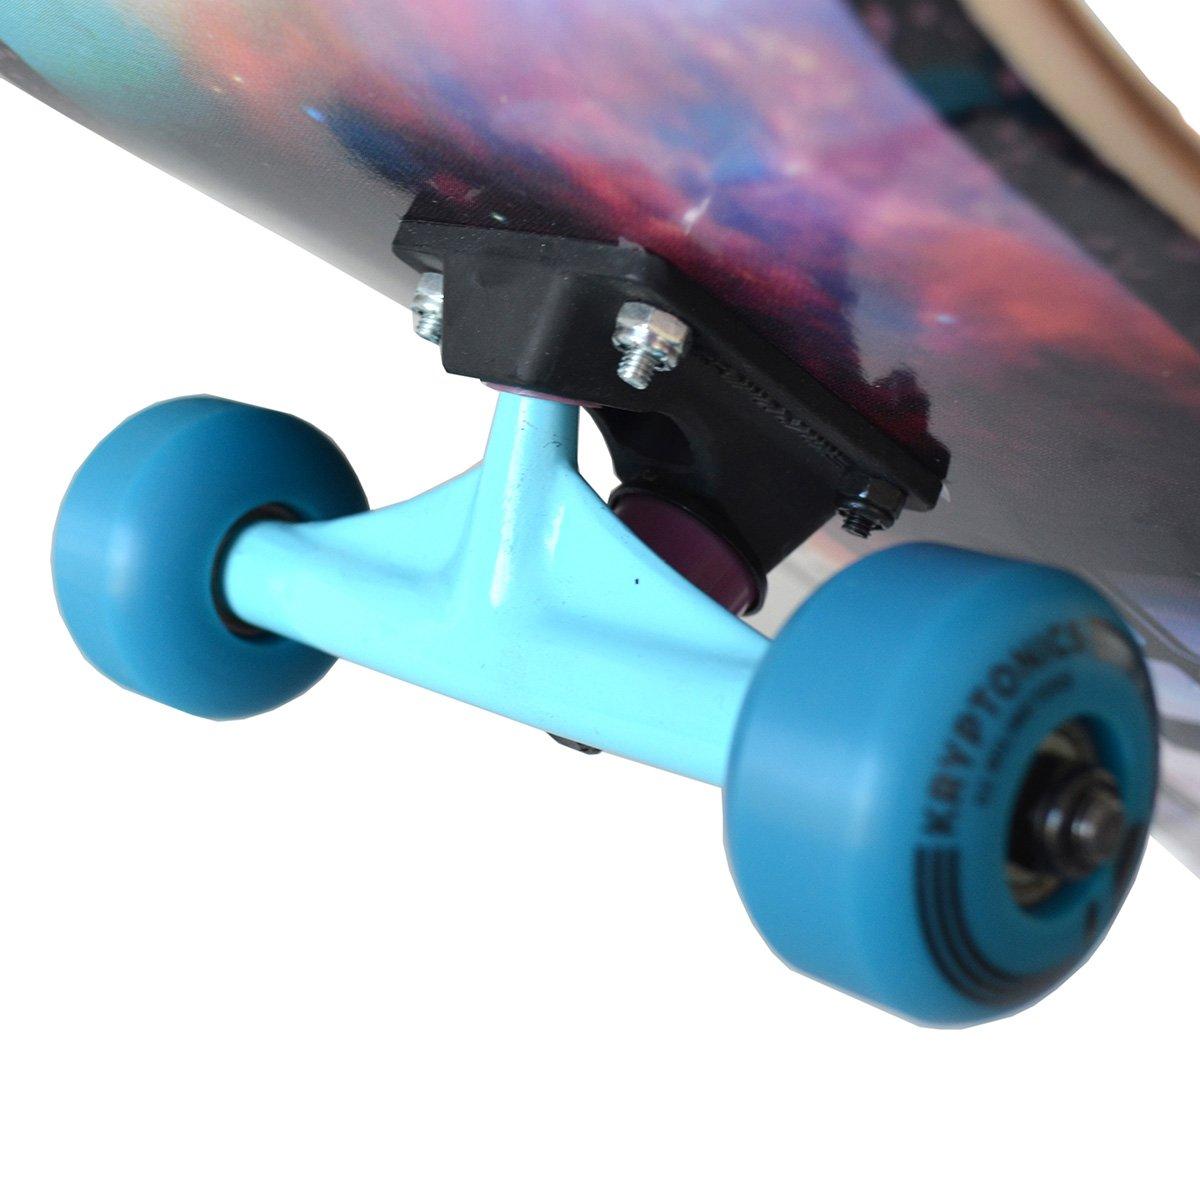 7c07fedc95 Skateboard Kryptonics Pro Galaxy - Compre Agora